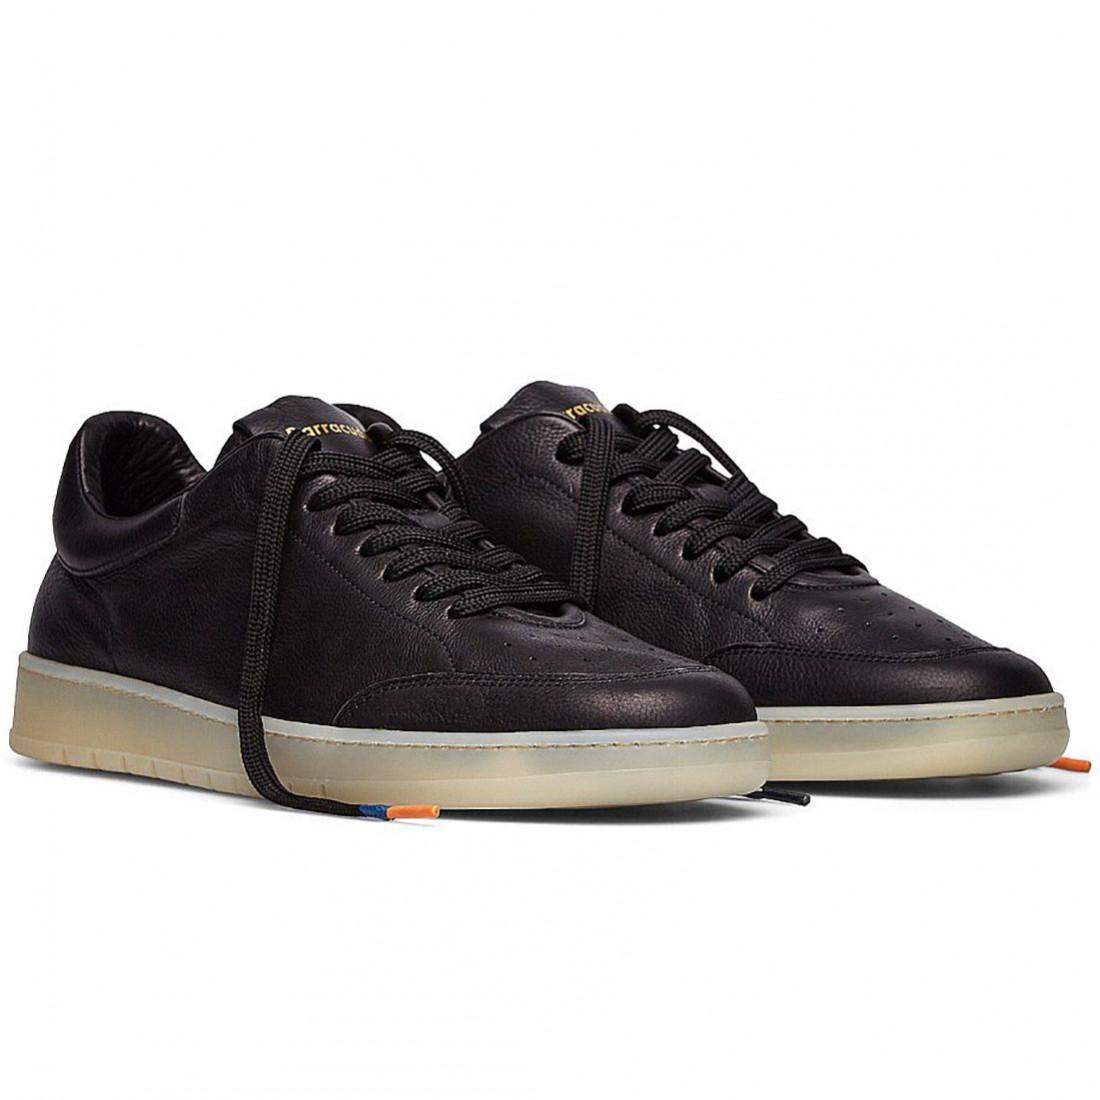 sneakers herren barracuda bu3372nero 8970